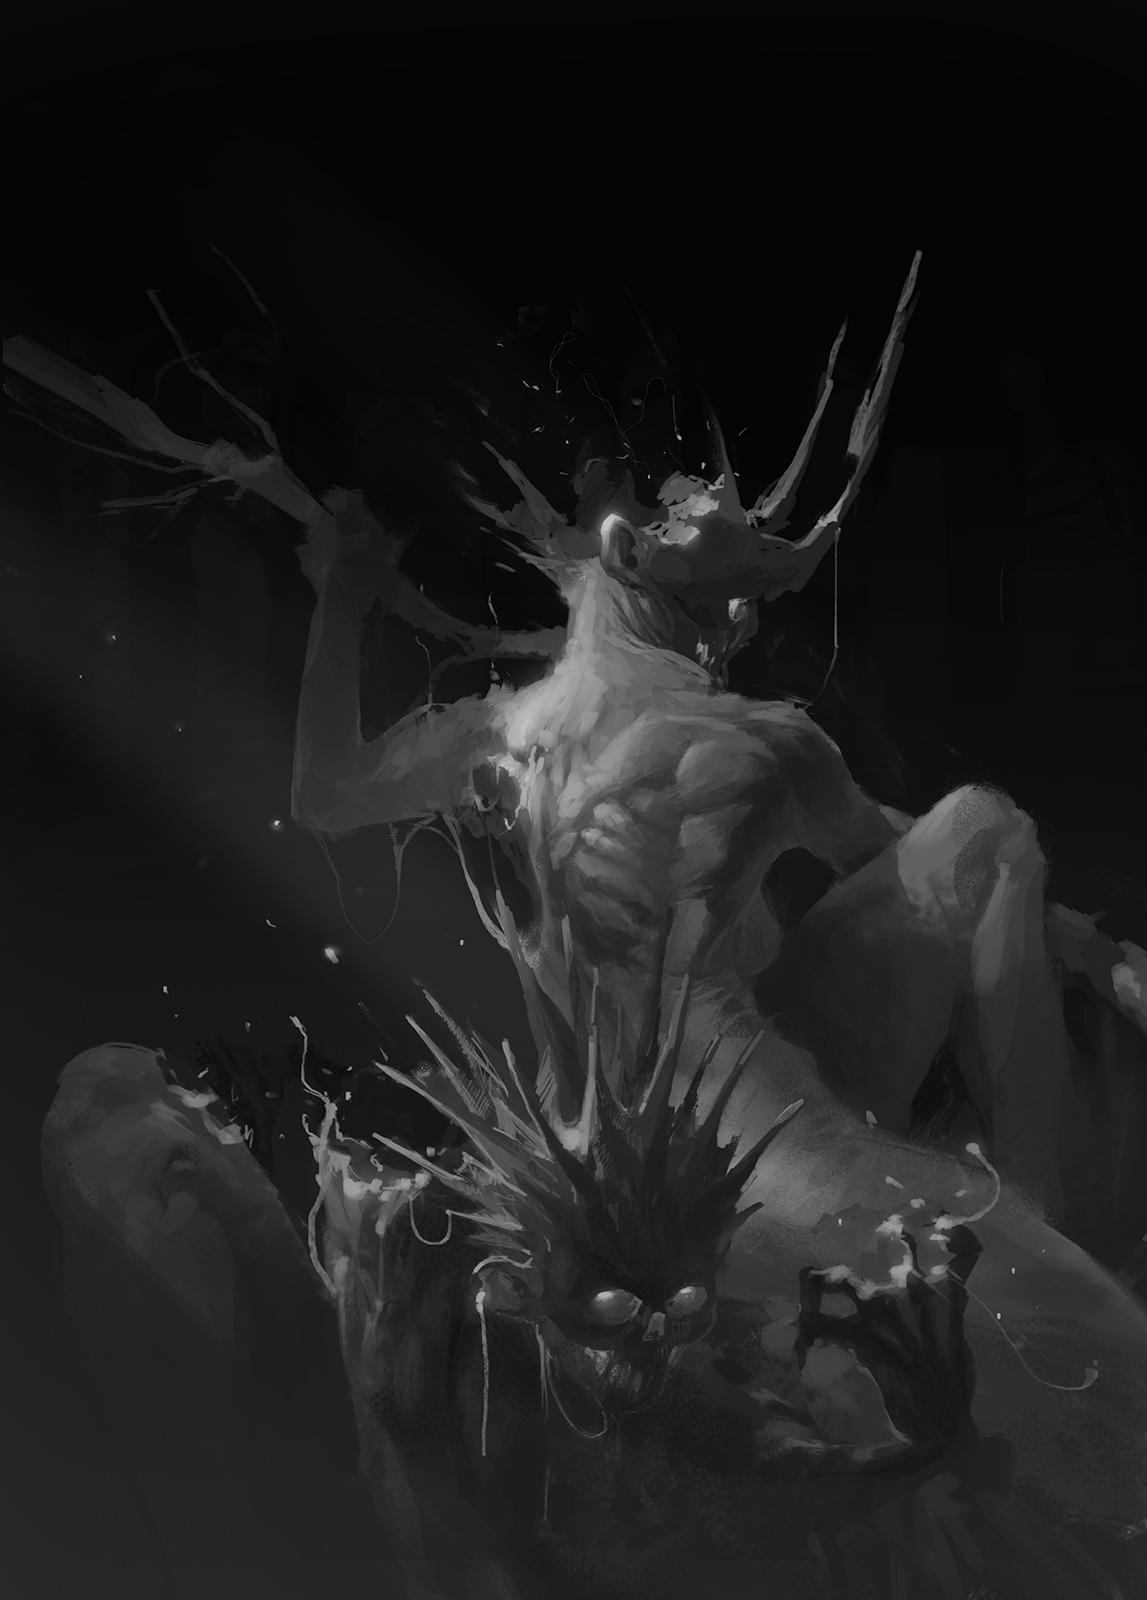 Aleksandrhade demons 1 63e893b8 zyjh